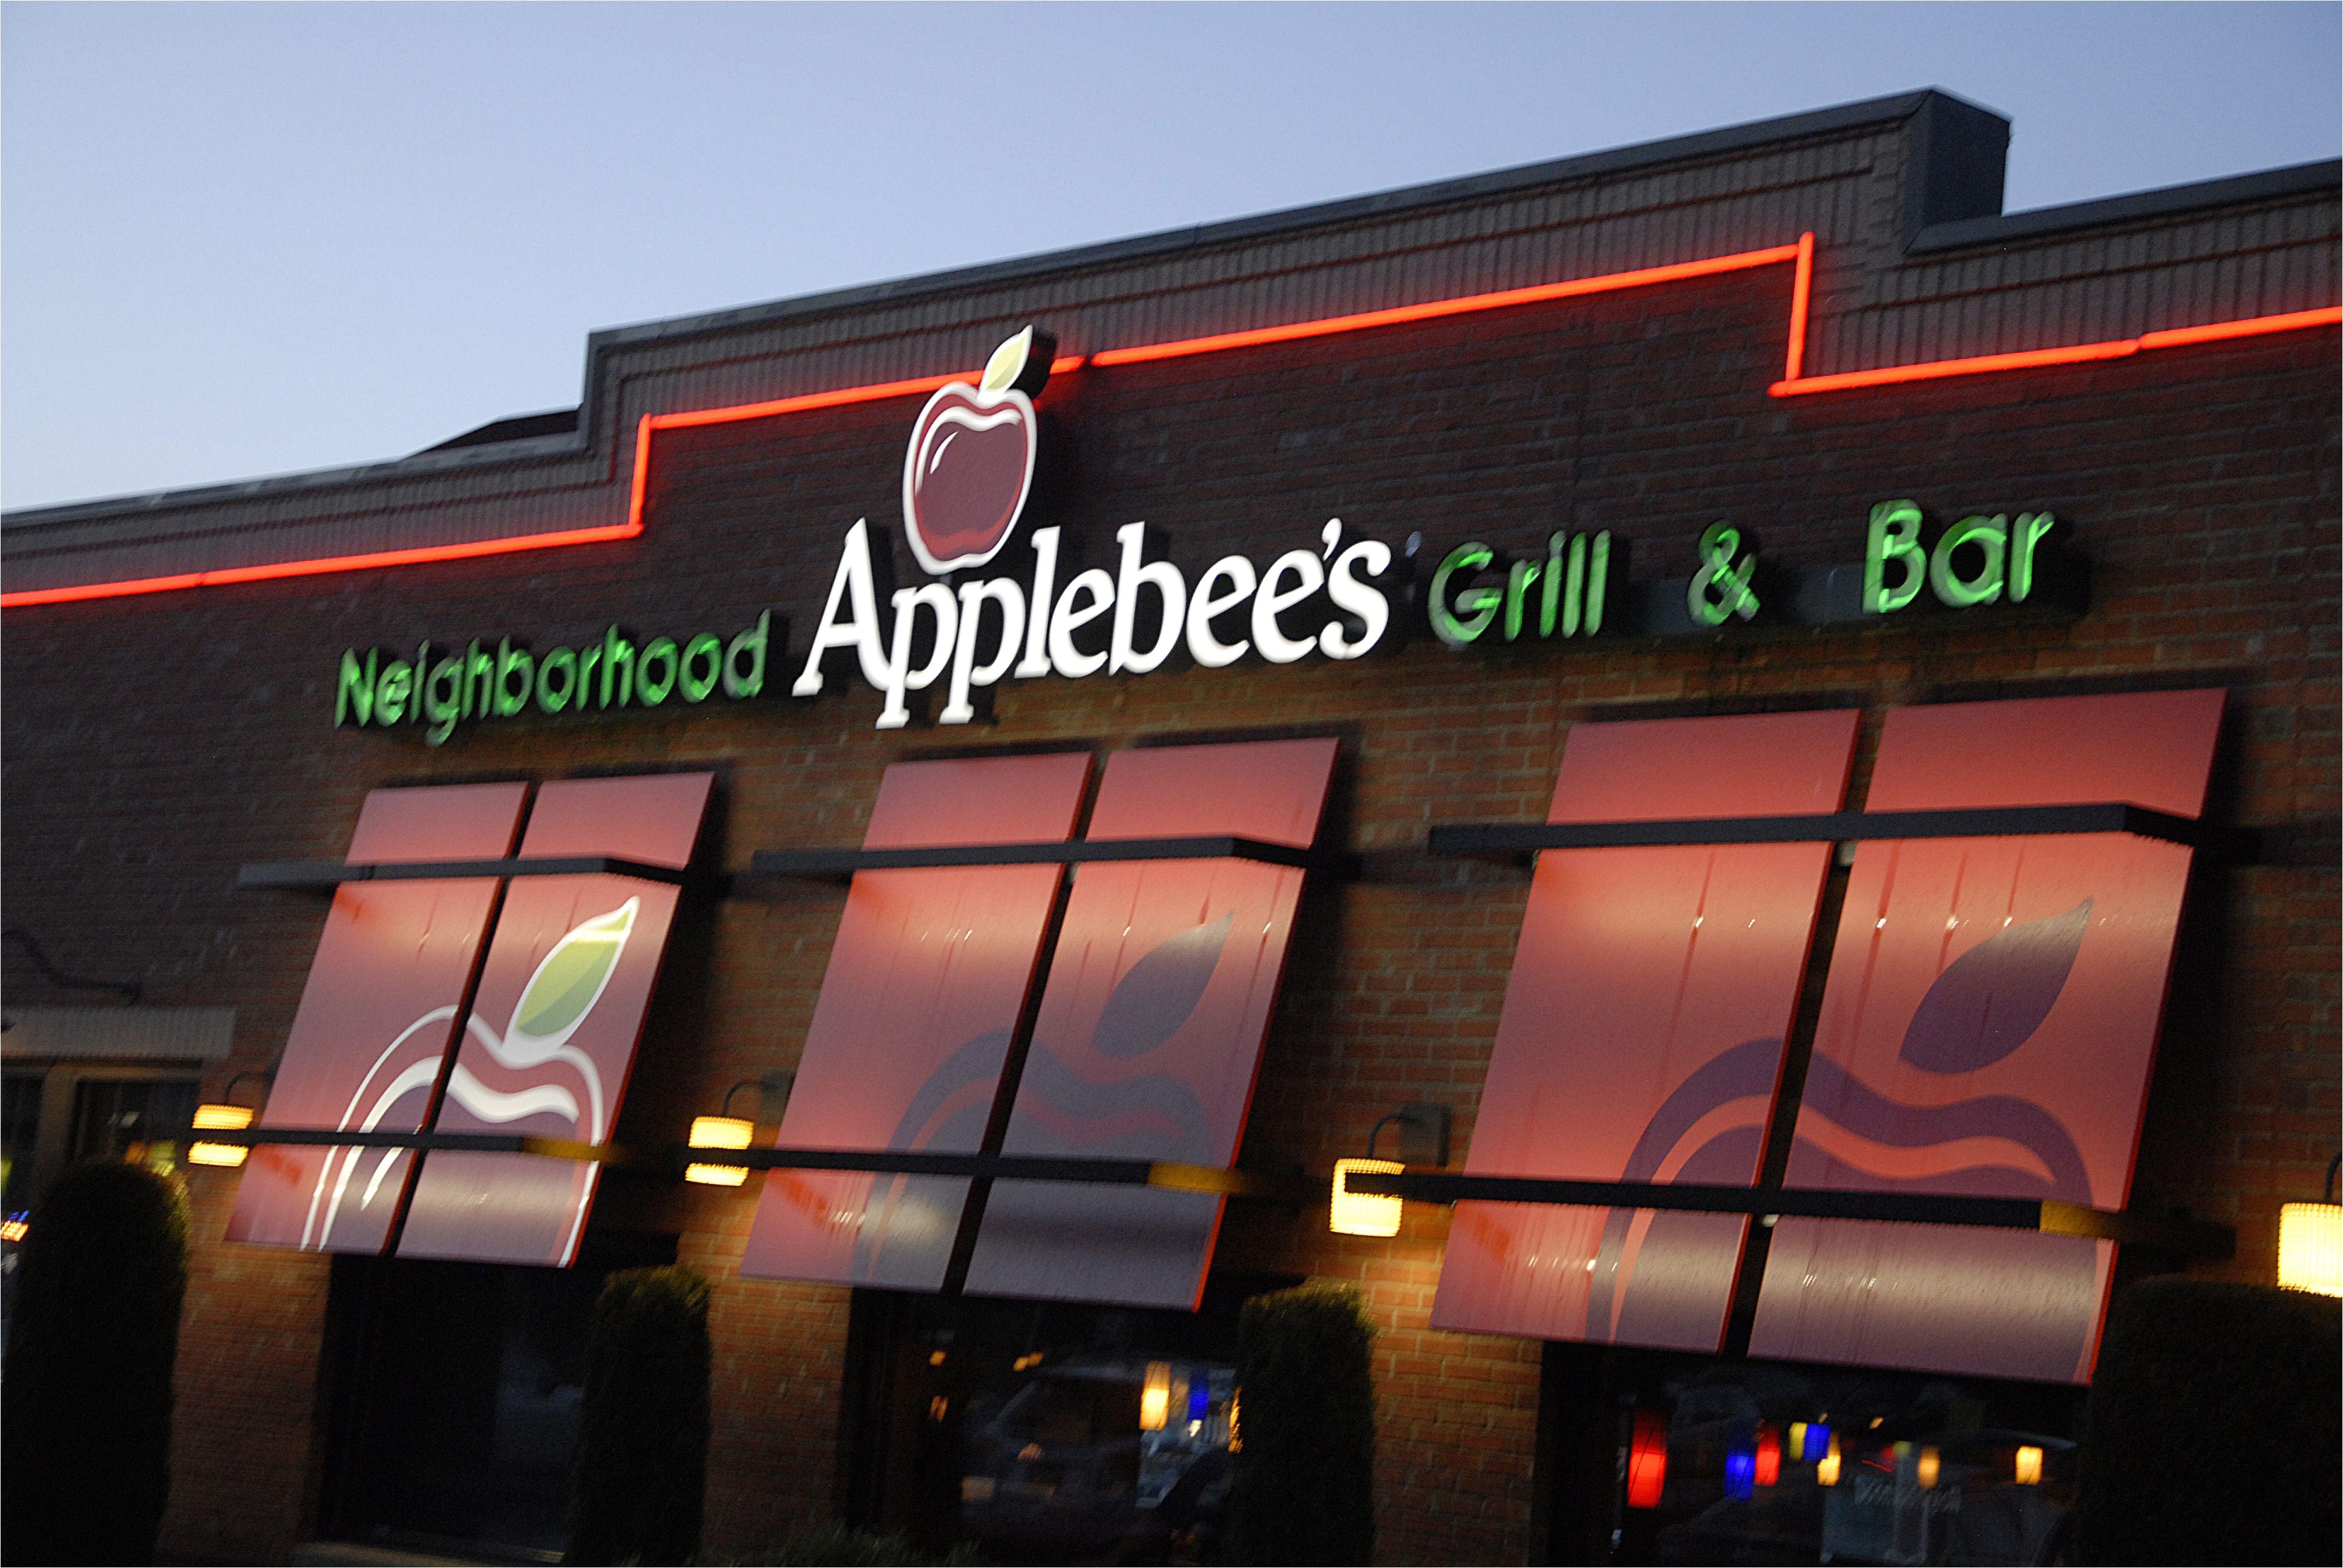 applebees food menu in buckley wshington usa 526249732 59717ab5d088c00010f33888 jpg